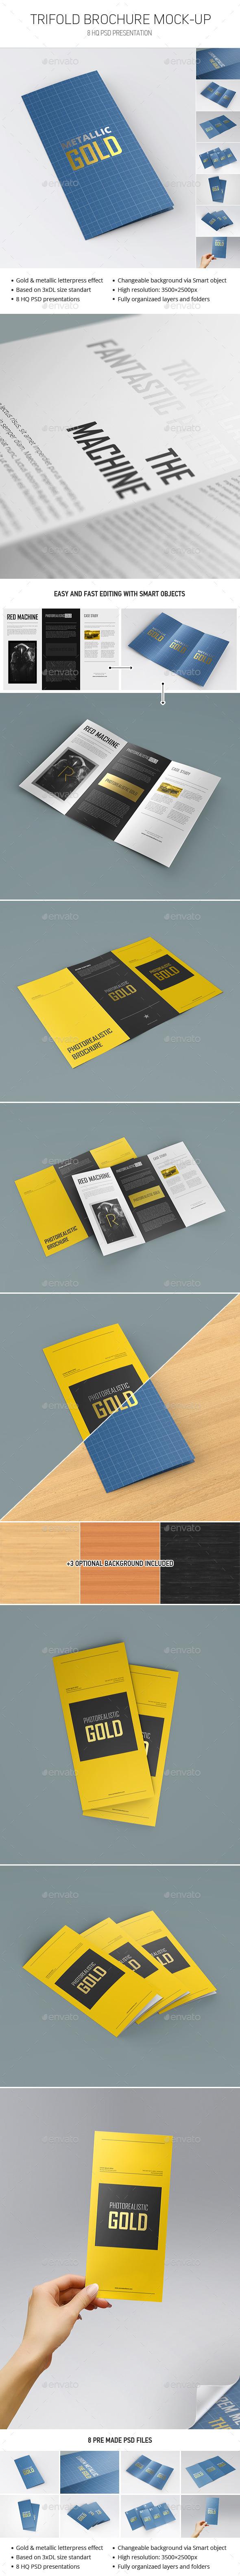 GraphicRiver Trifold Brochure Mockup 9945646